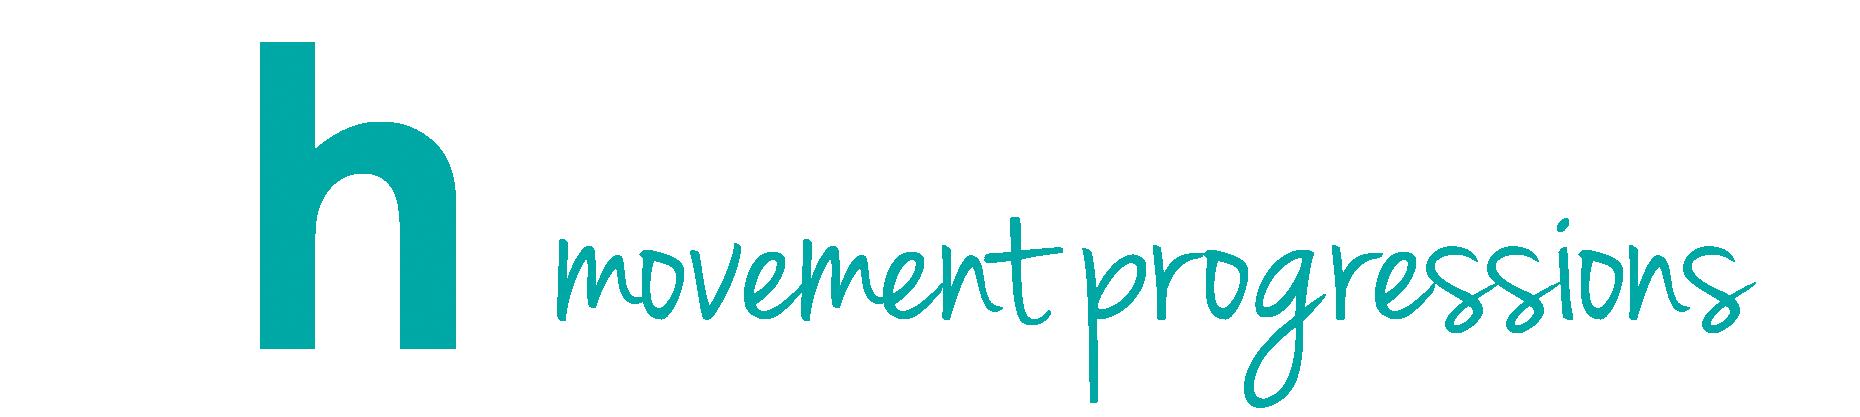 hayleyhealey mvmt prog white logo.png